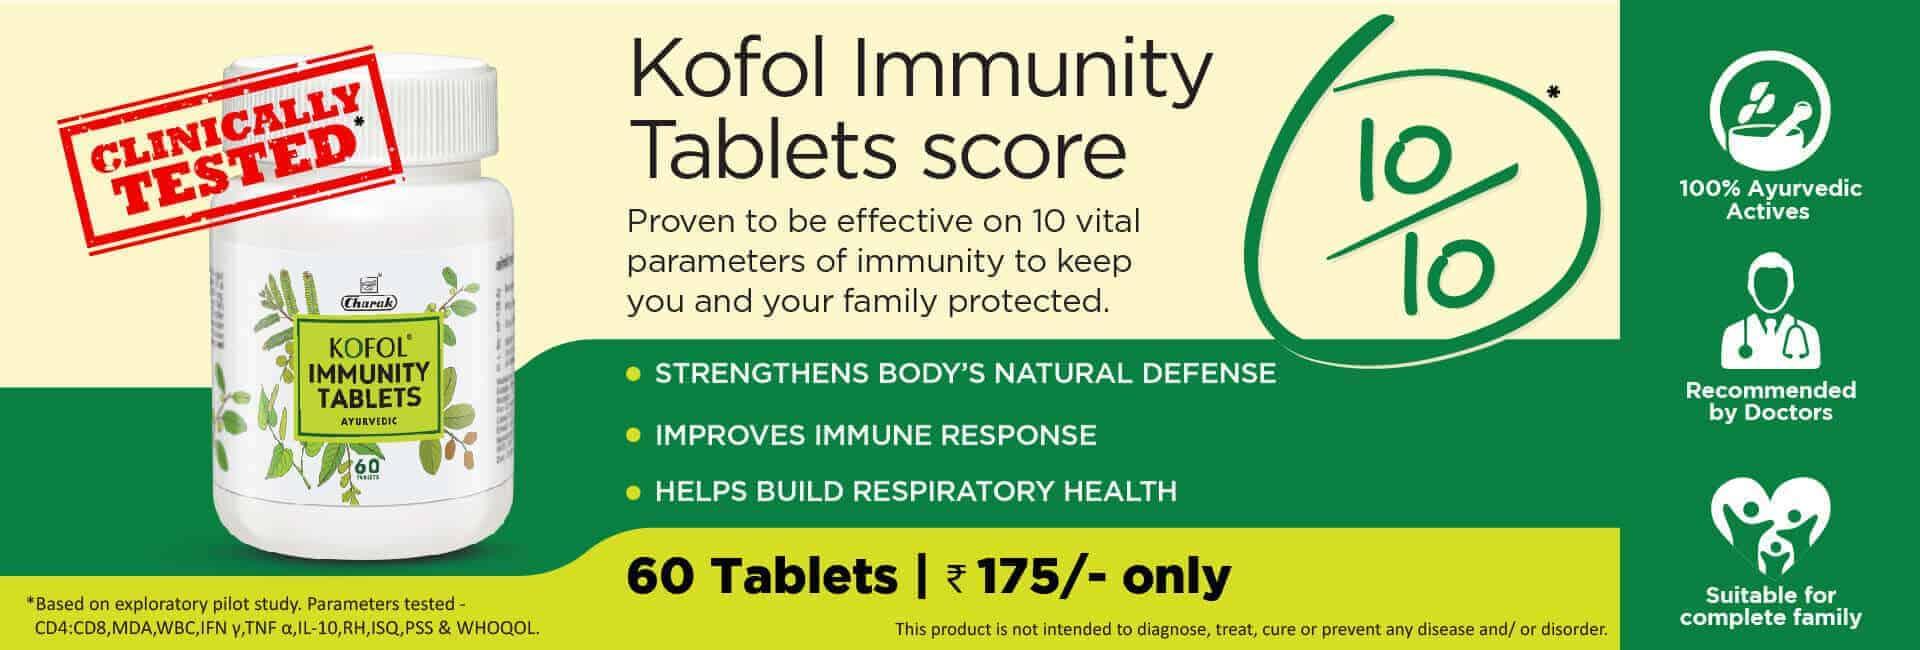 Kofol Immunity Tablets